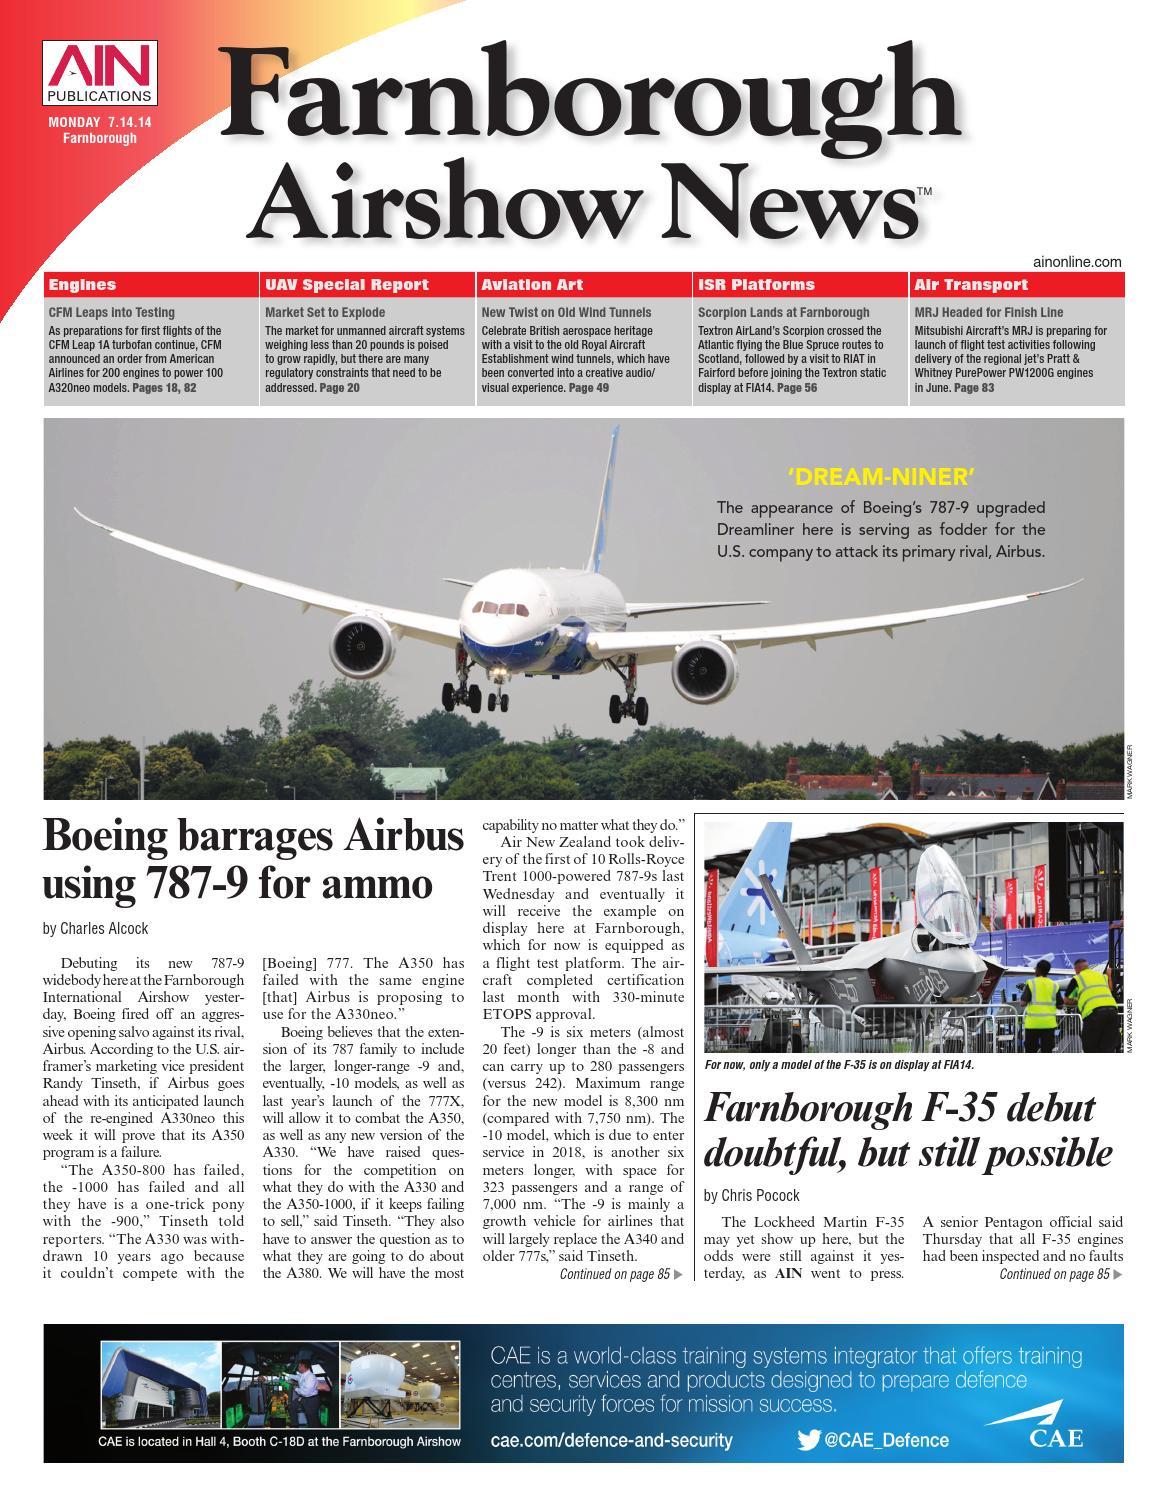 Textron Scorpion Jet News: Farnborough Airshow News 07-14-14 By Aviation